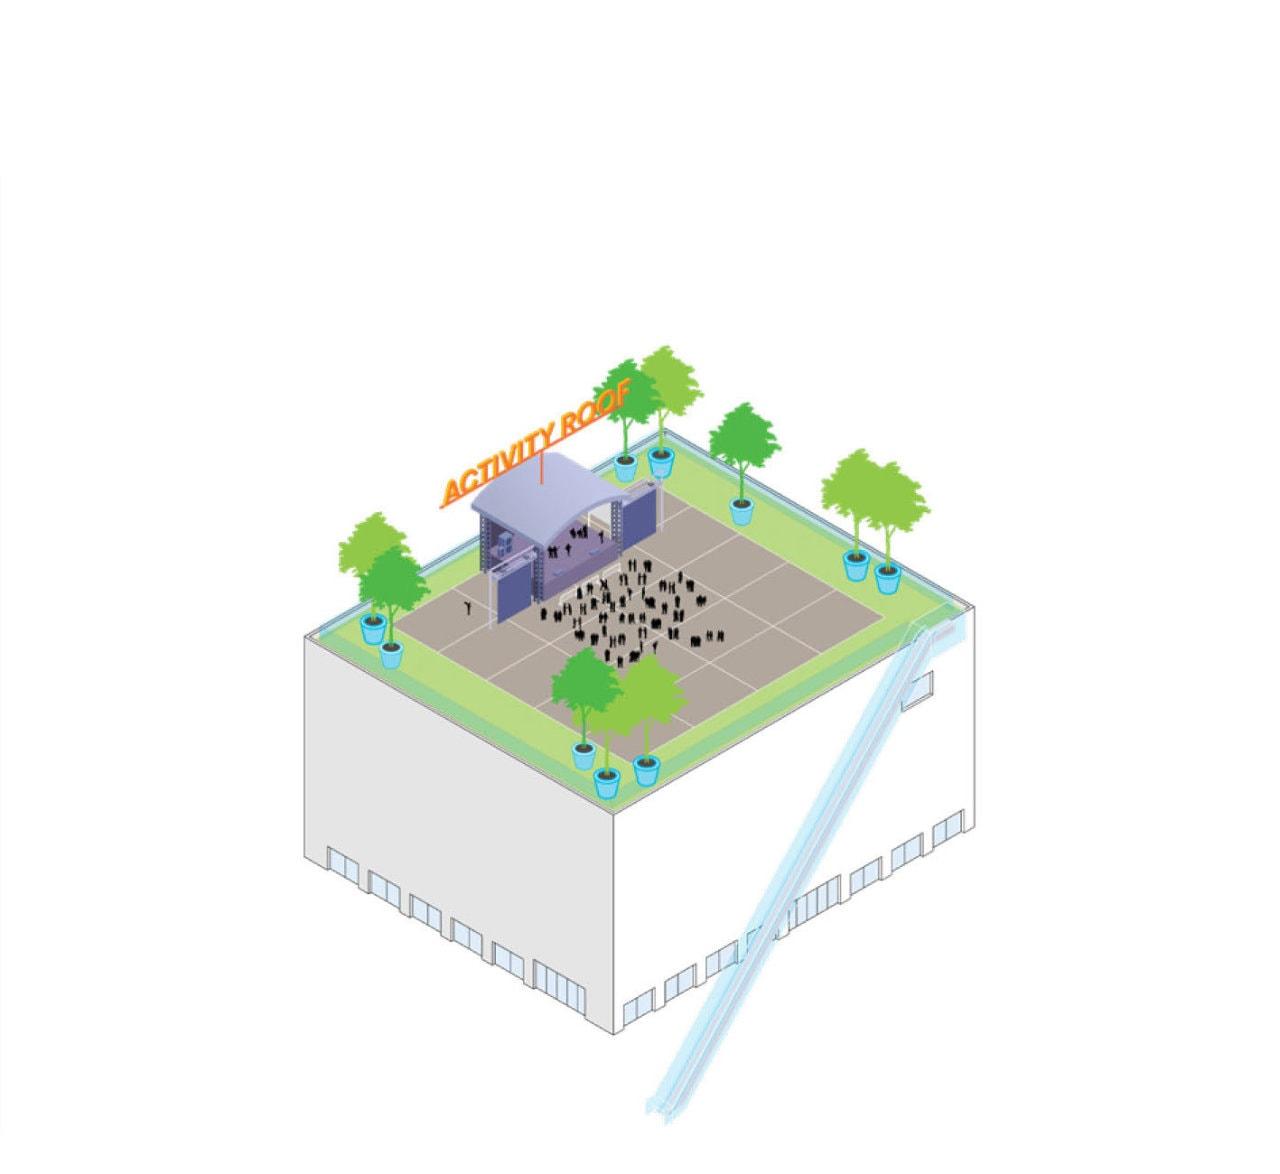 City Stage/Event Plaza